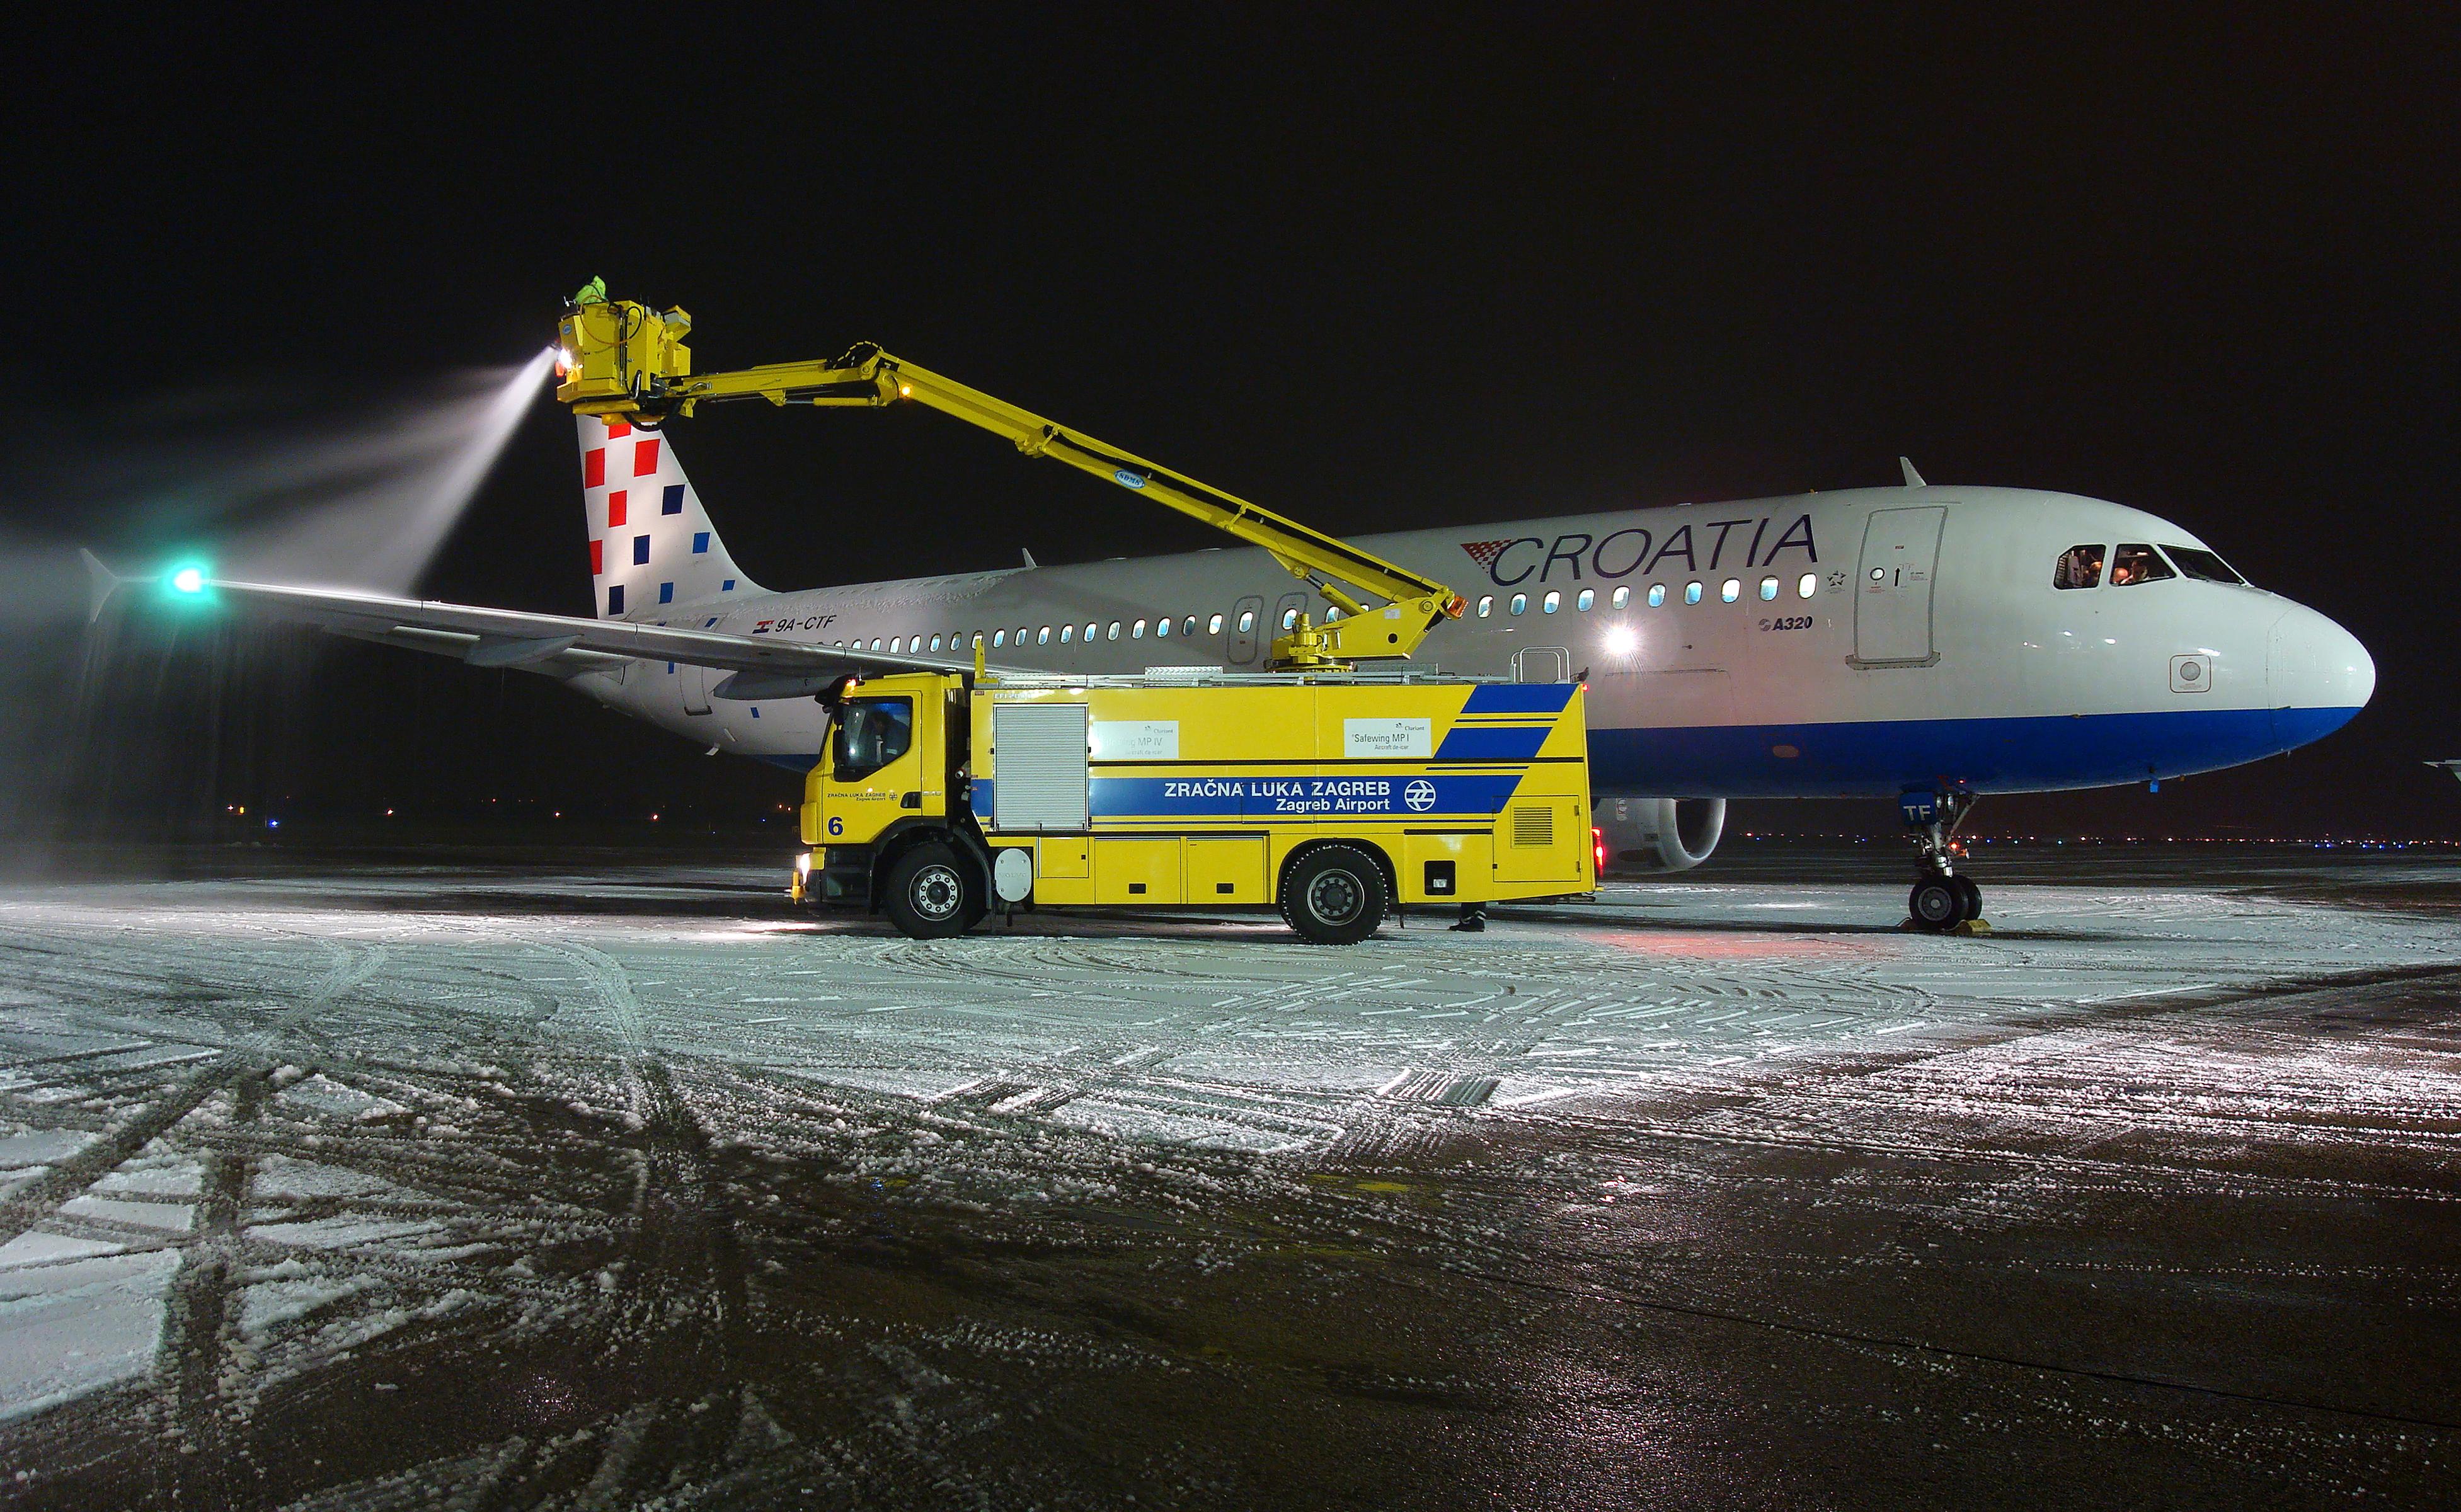 Build A Truck >> File:De-icing Croatia Airlines.jpg - Wikimedia Commons